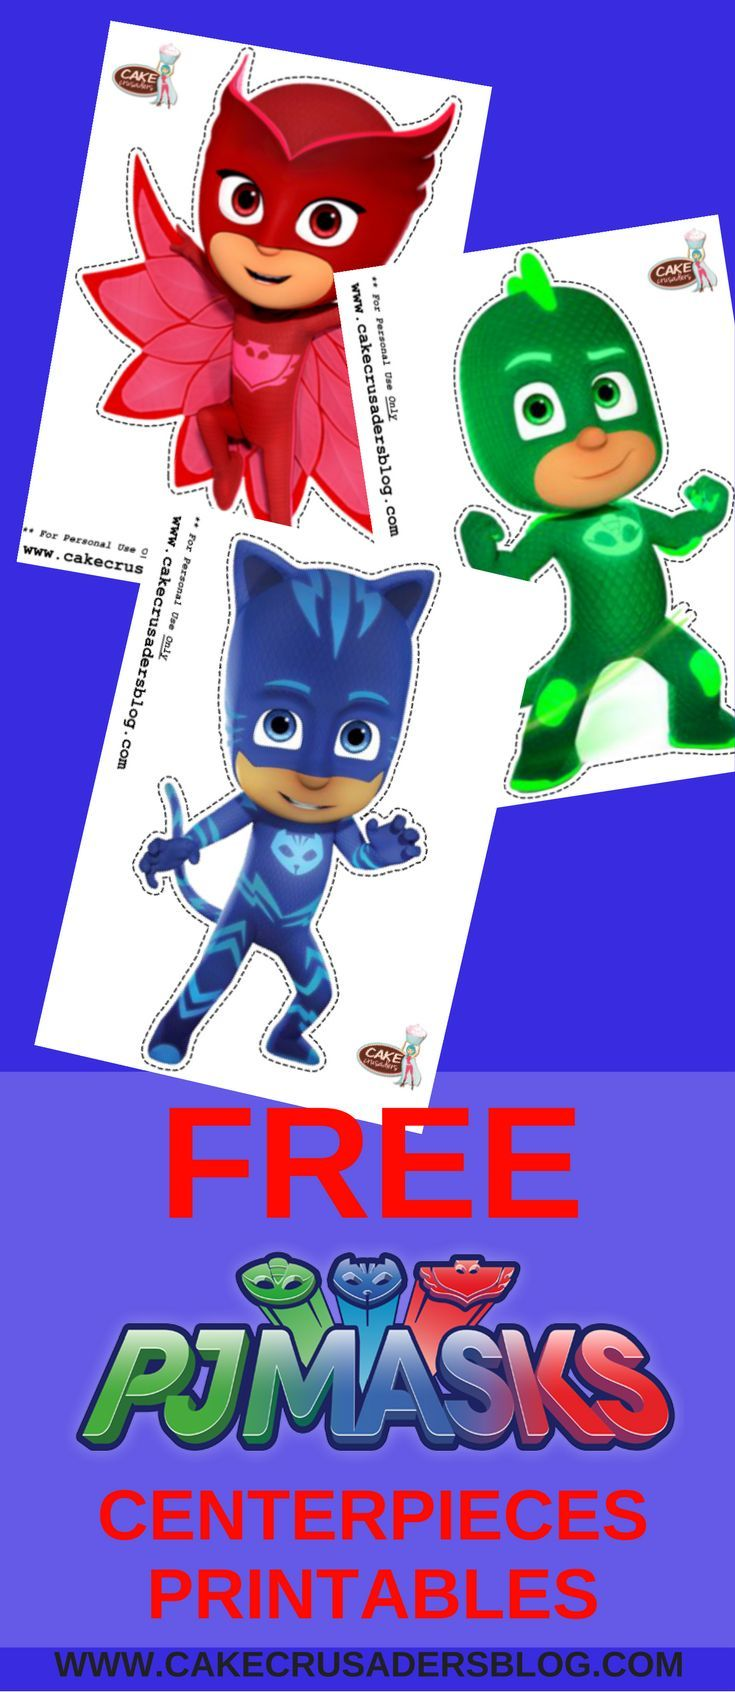 FREE PJ Mask DIY Party Printables